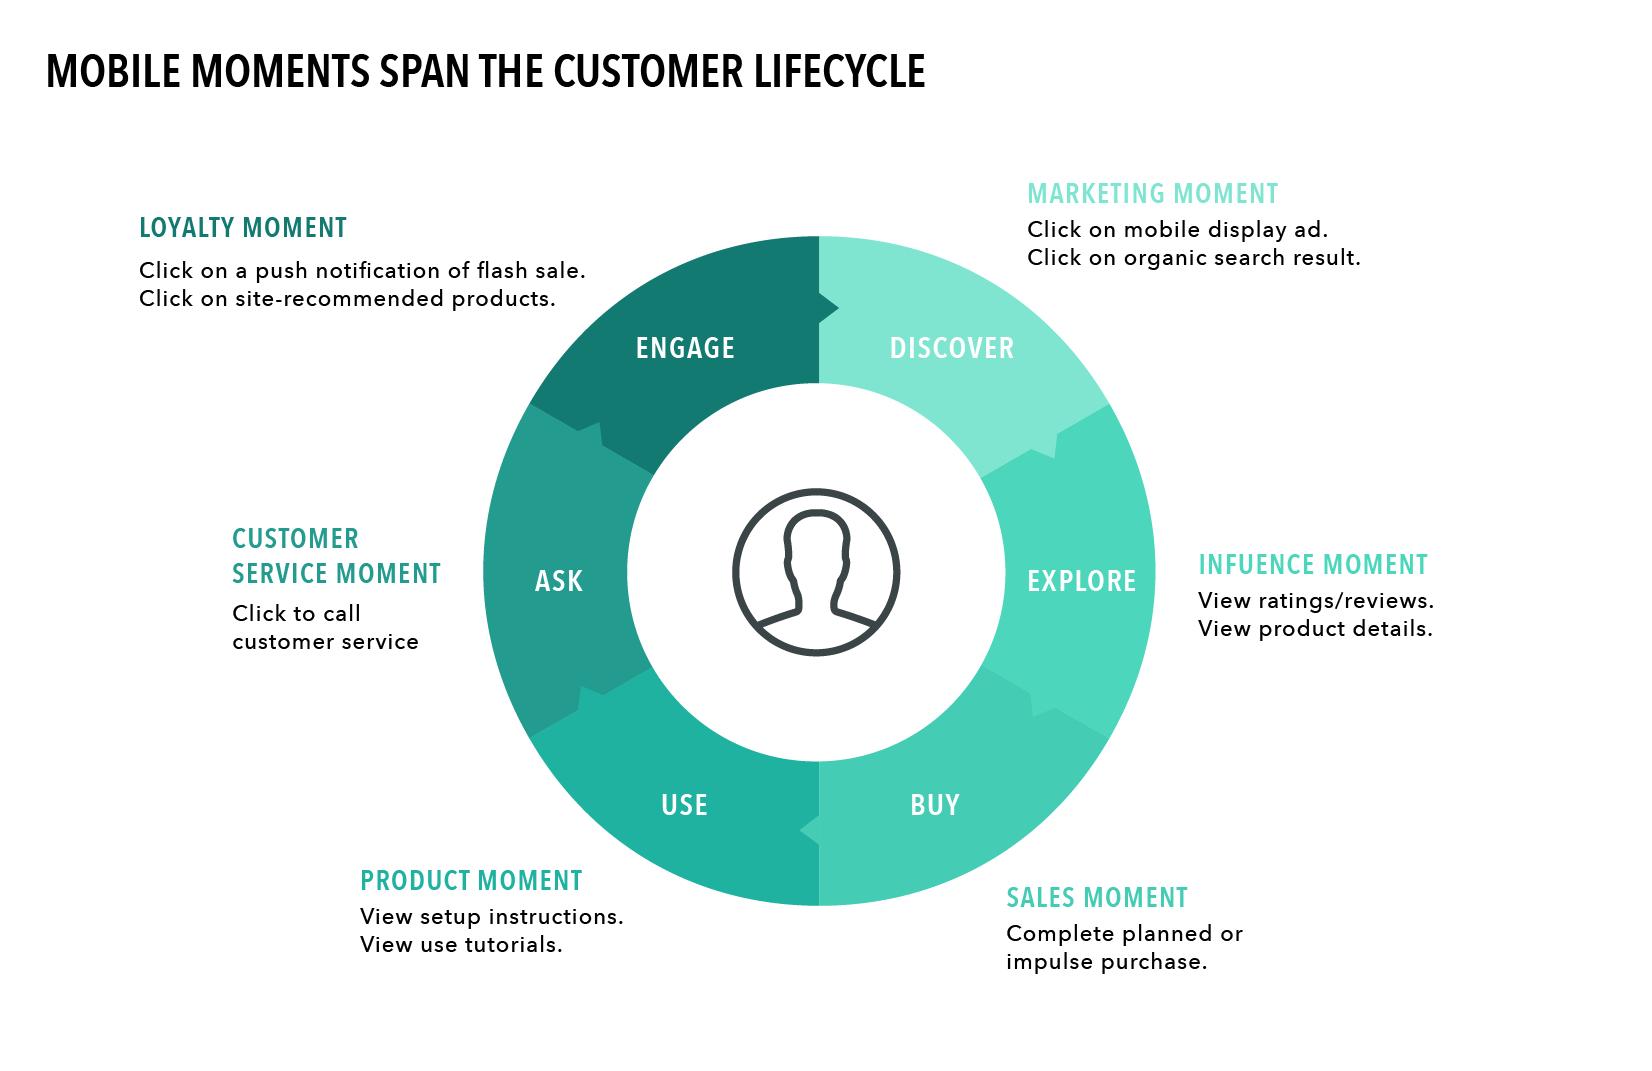 mobile moments span customer lifecycle